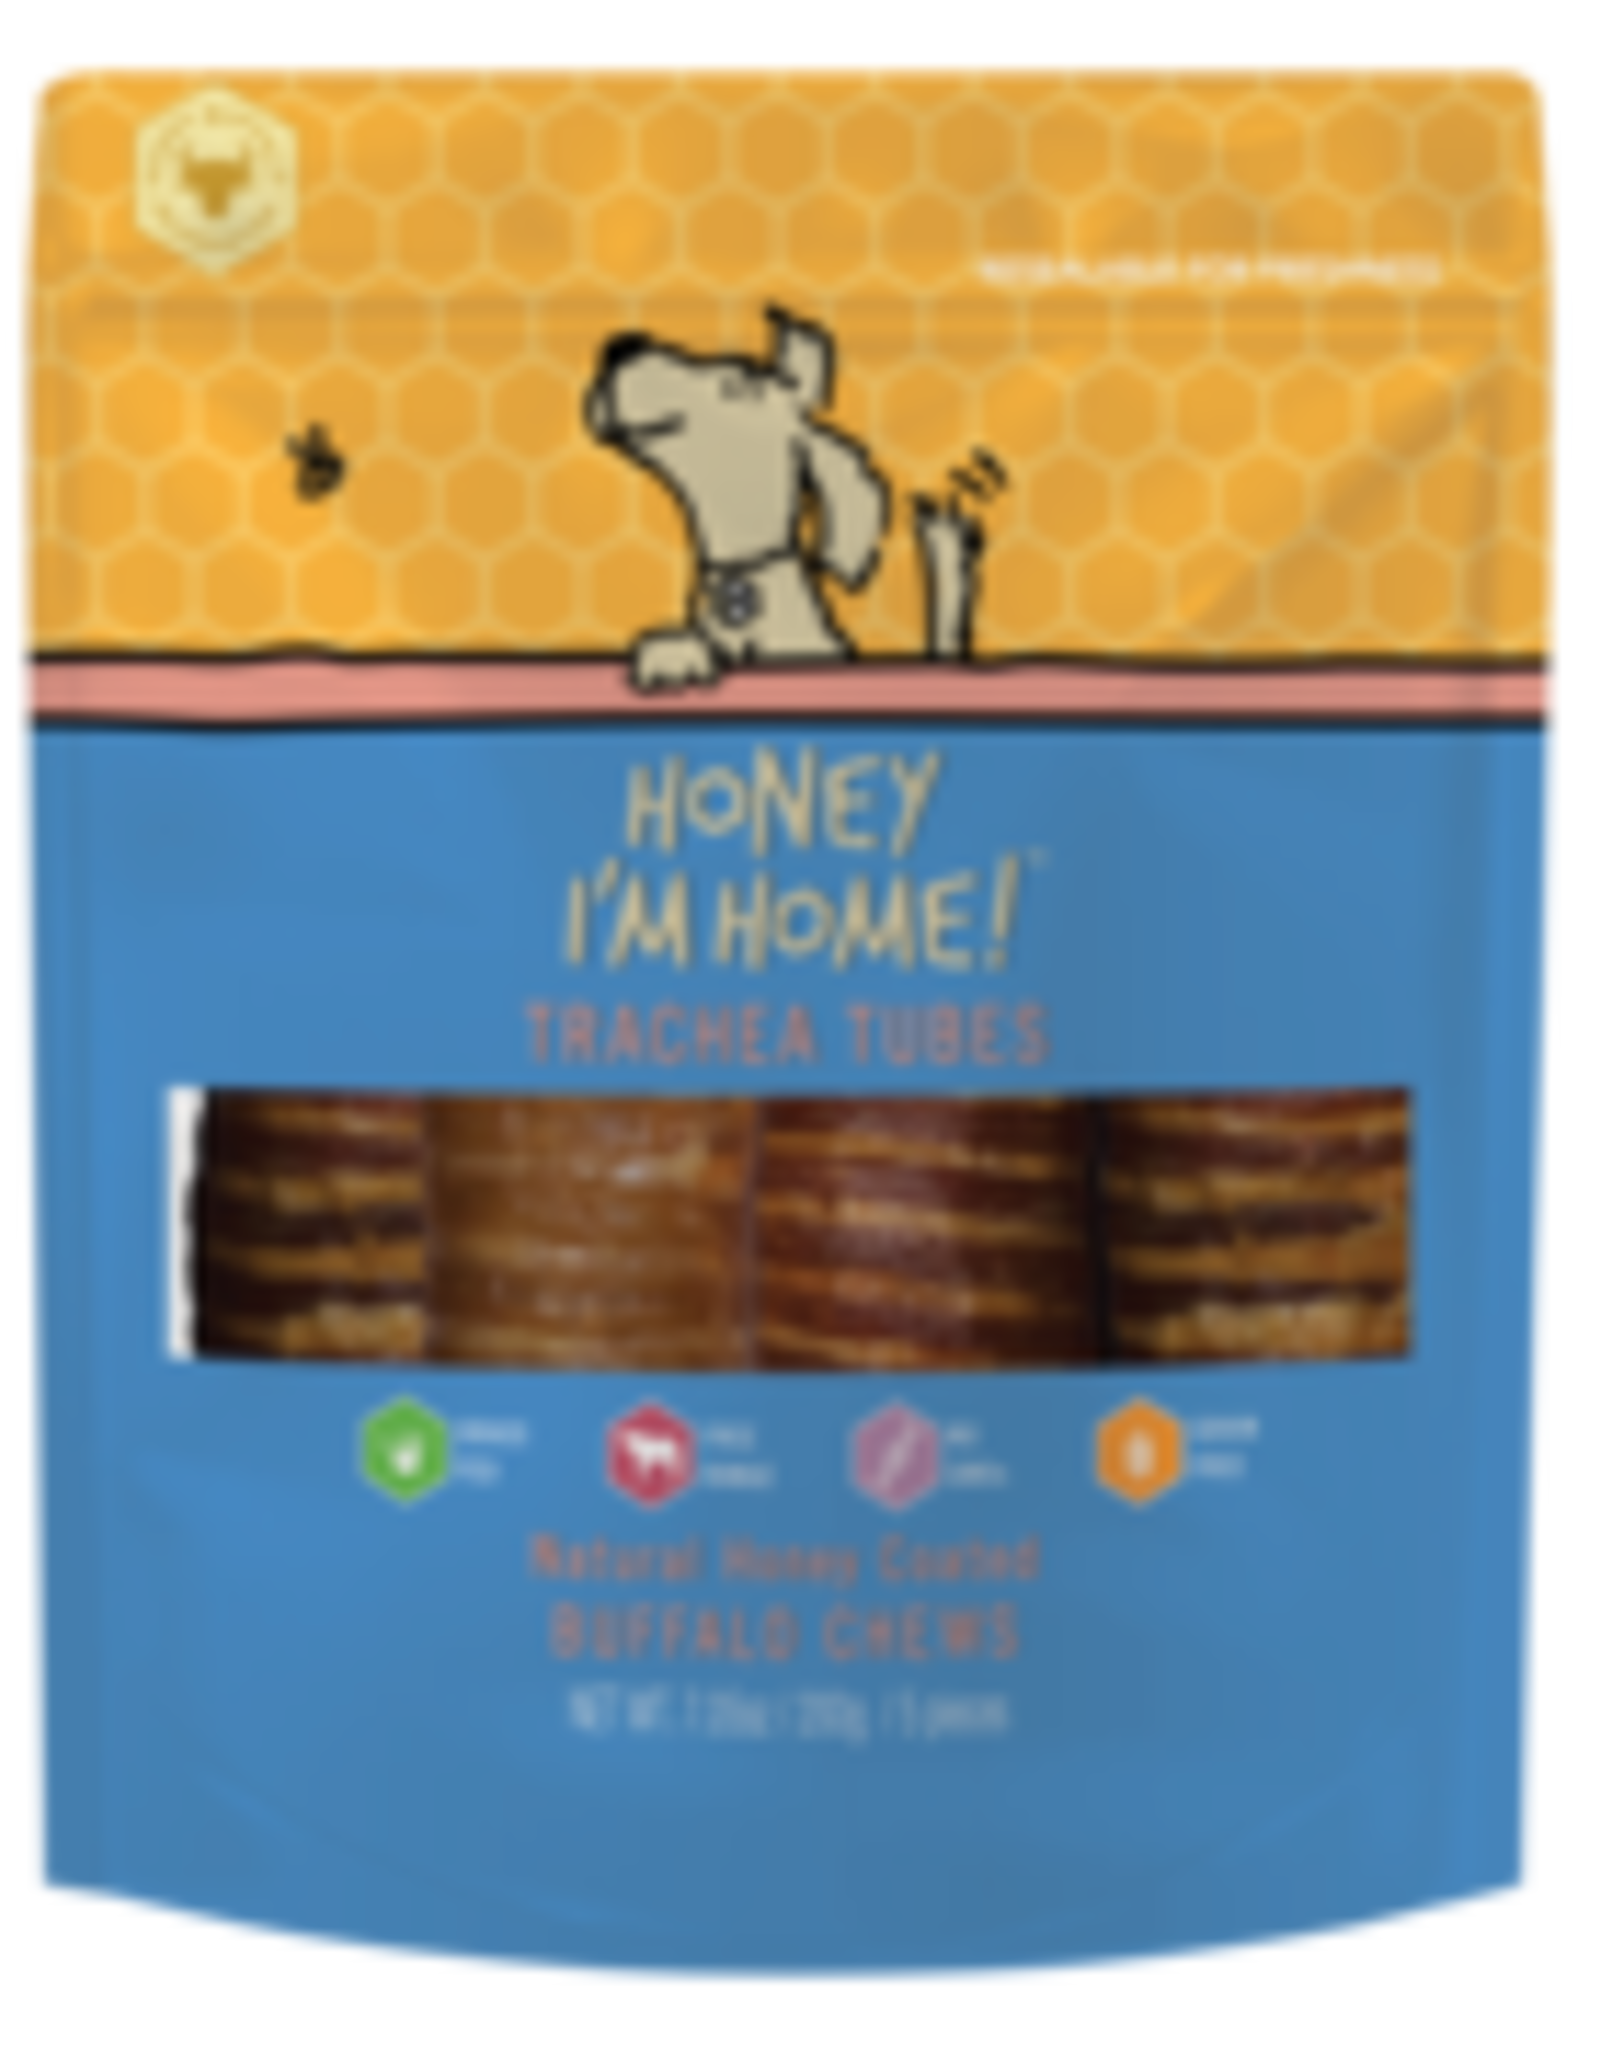 Honey I'm Home Honey I'm Home Buffalo Trachea Tubes 5pk